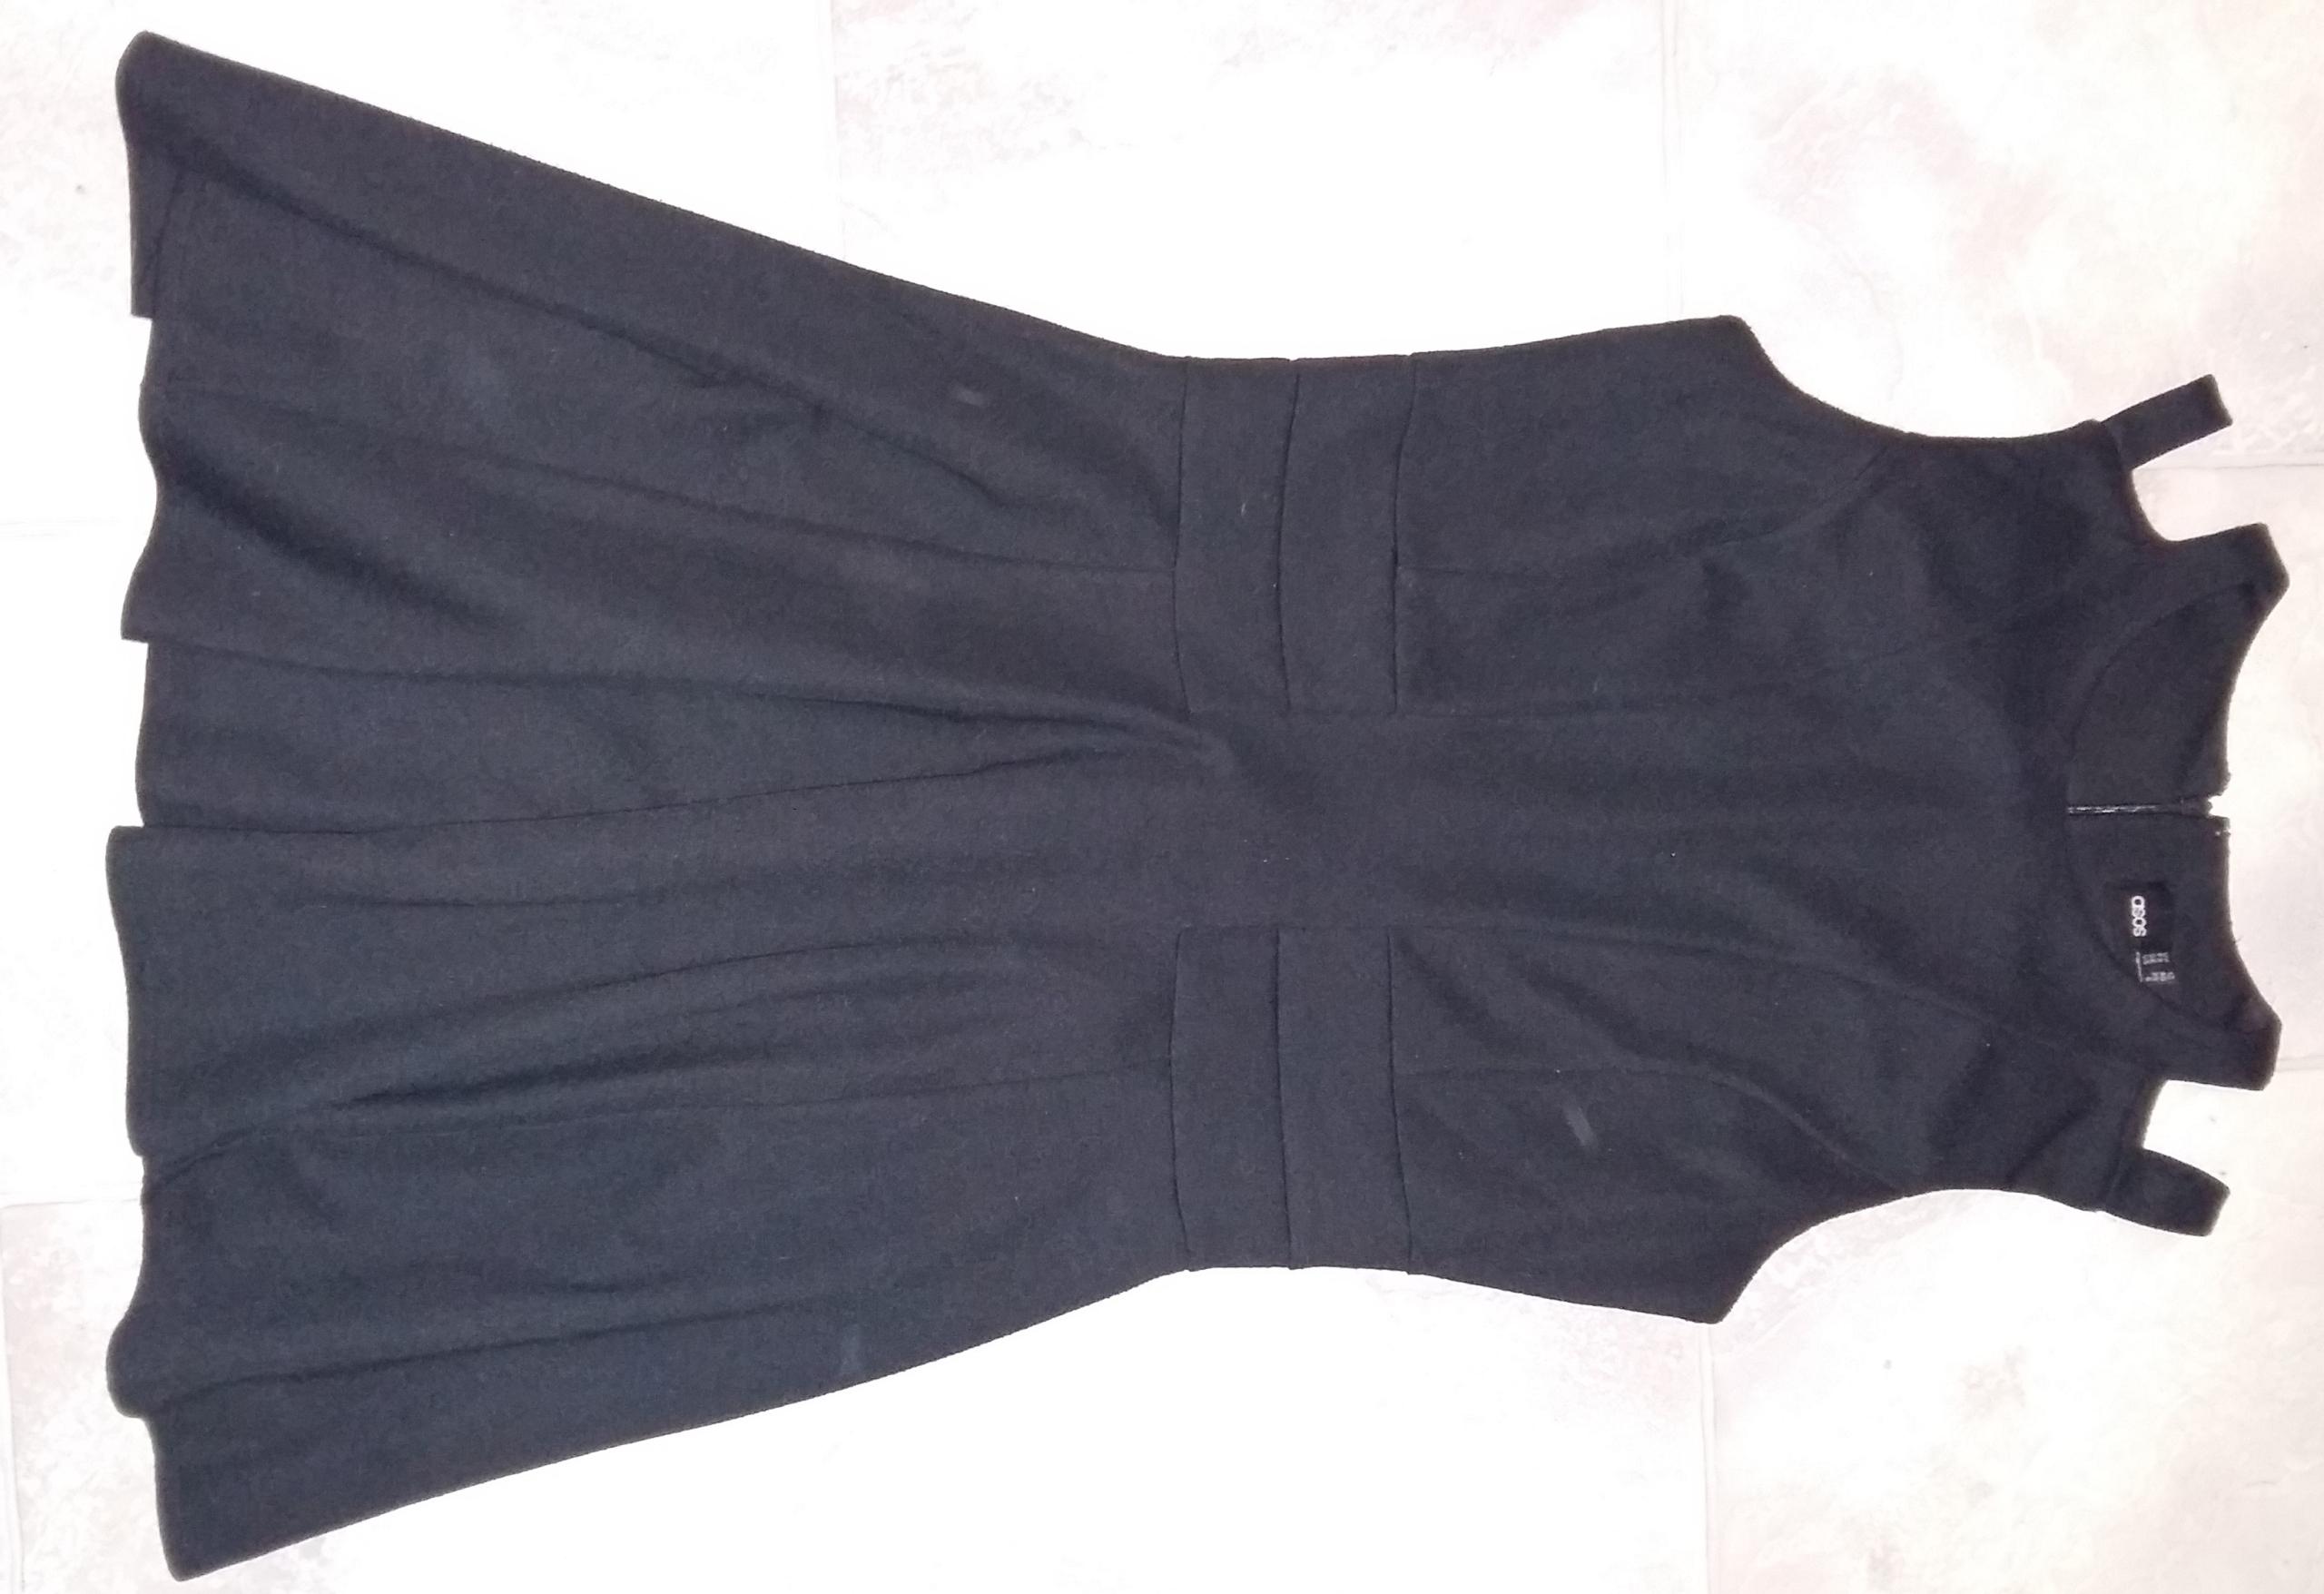 9711f03ae9 sukienka mała czarna Asos 38 M jak Reserved Mohito - 7650506005 ...